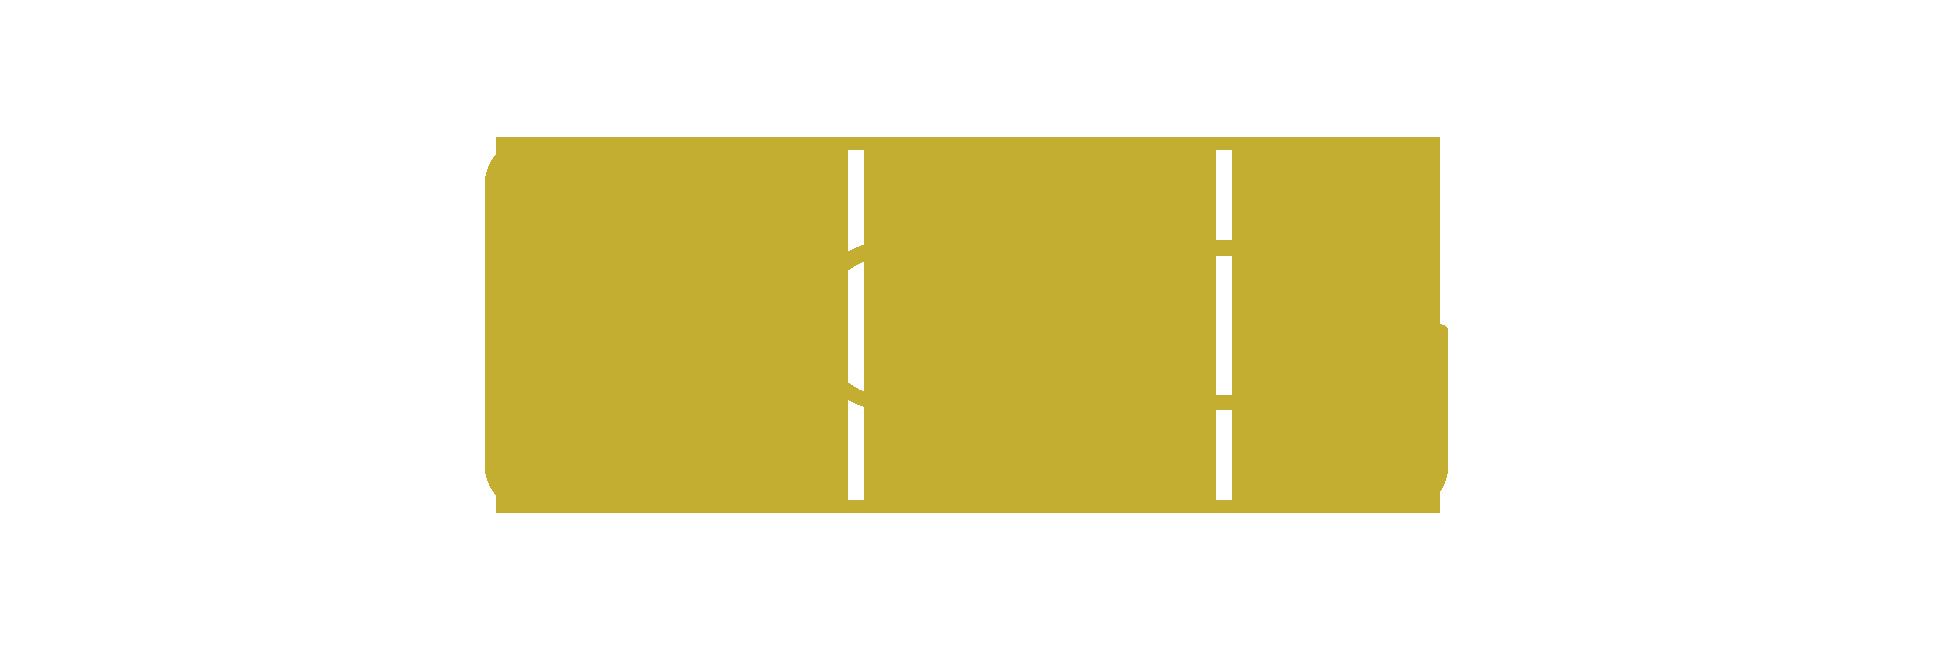 37602000000212006 zc v54 1602593144478 filmfreeway gold light